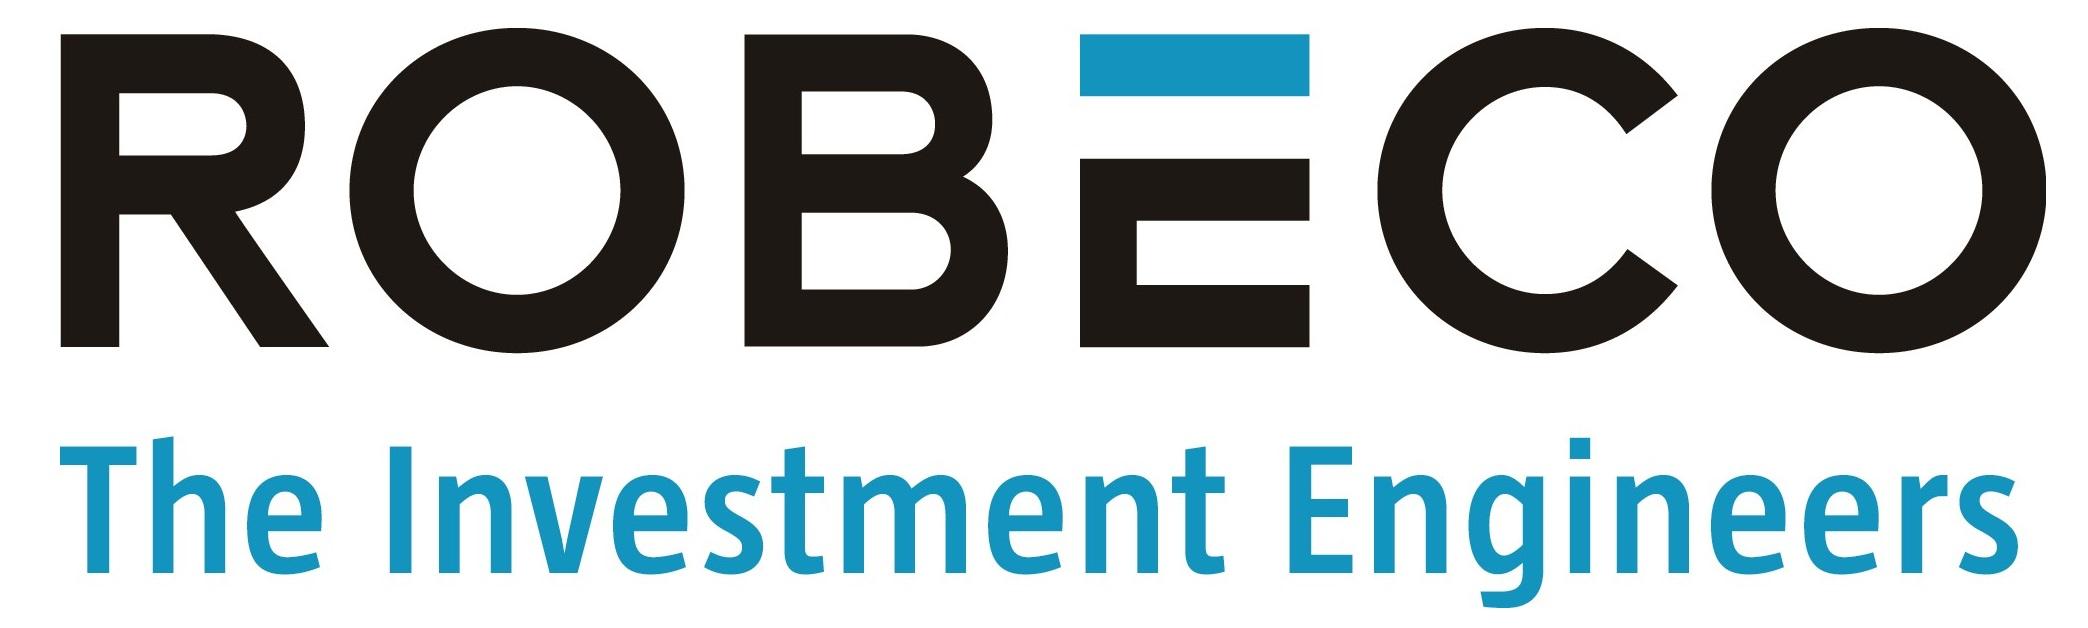 Robeco-Logo.jpg